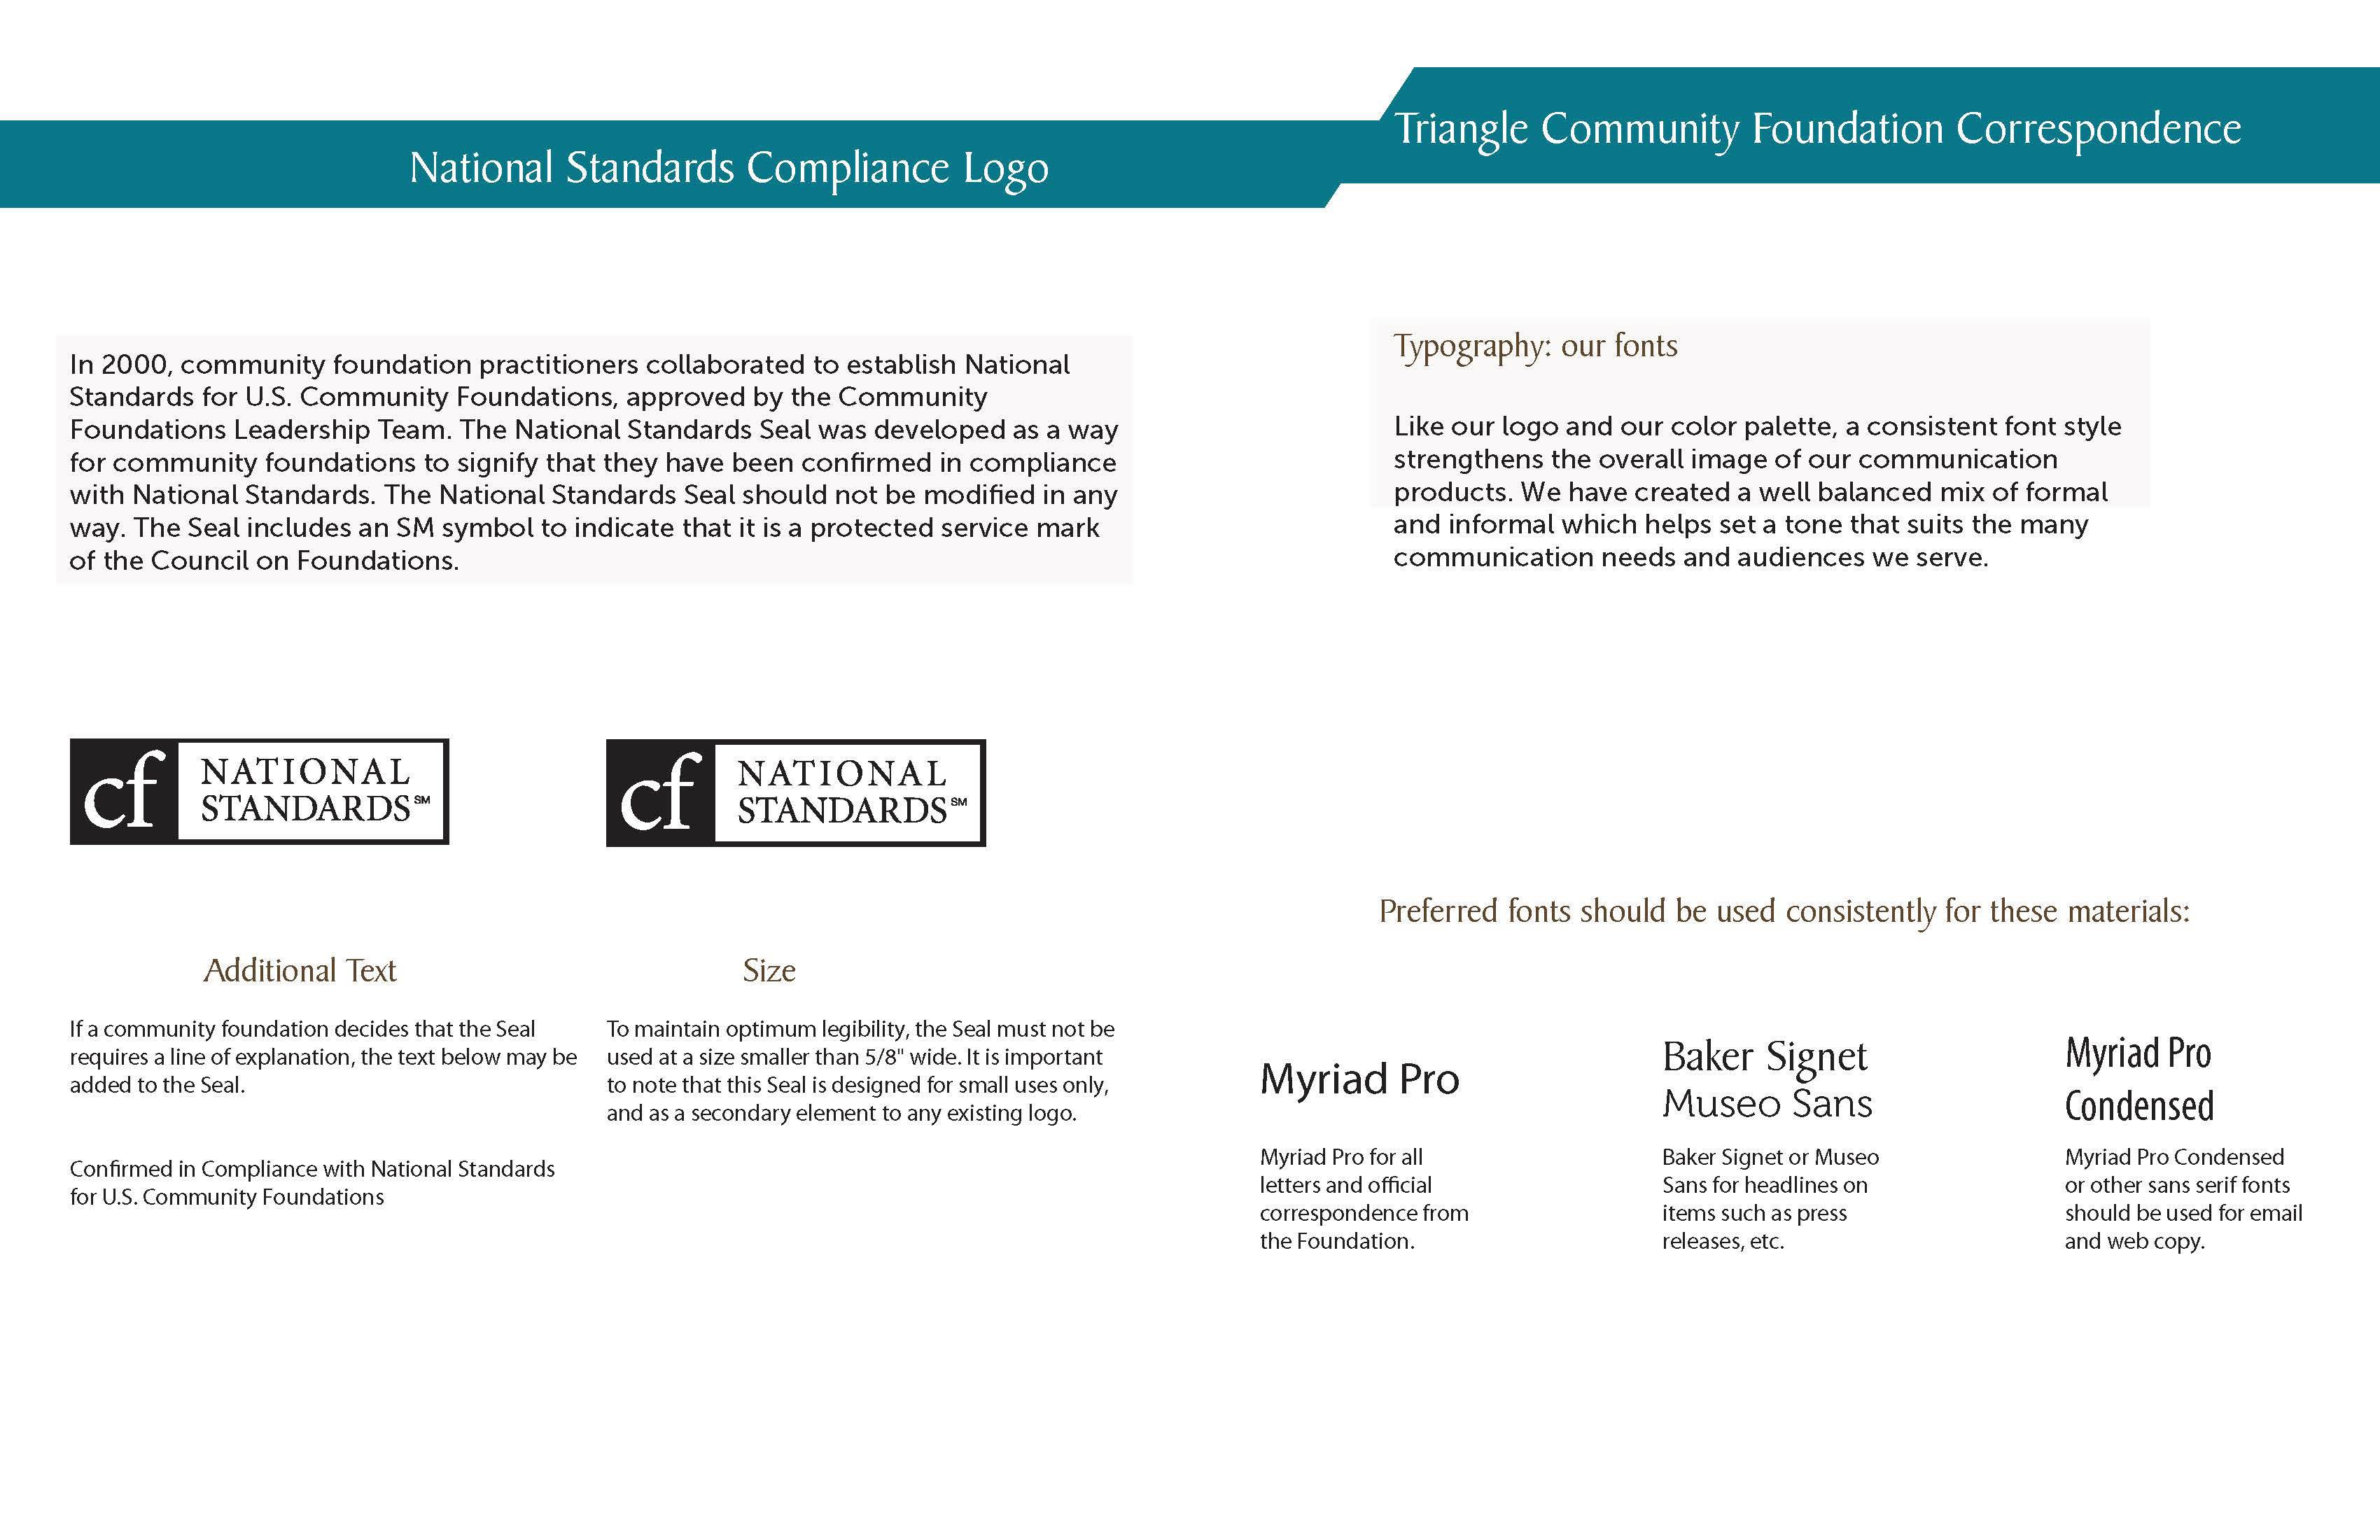 Adrian's Portfolio - Process Book (Triangle Community